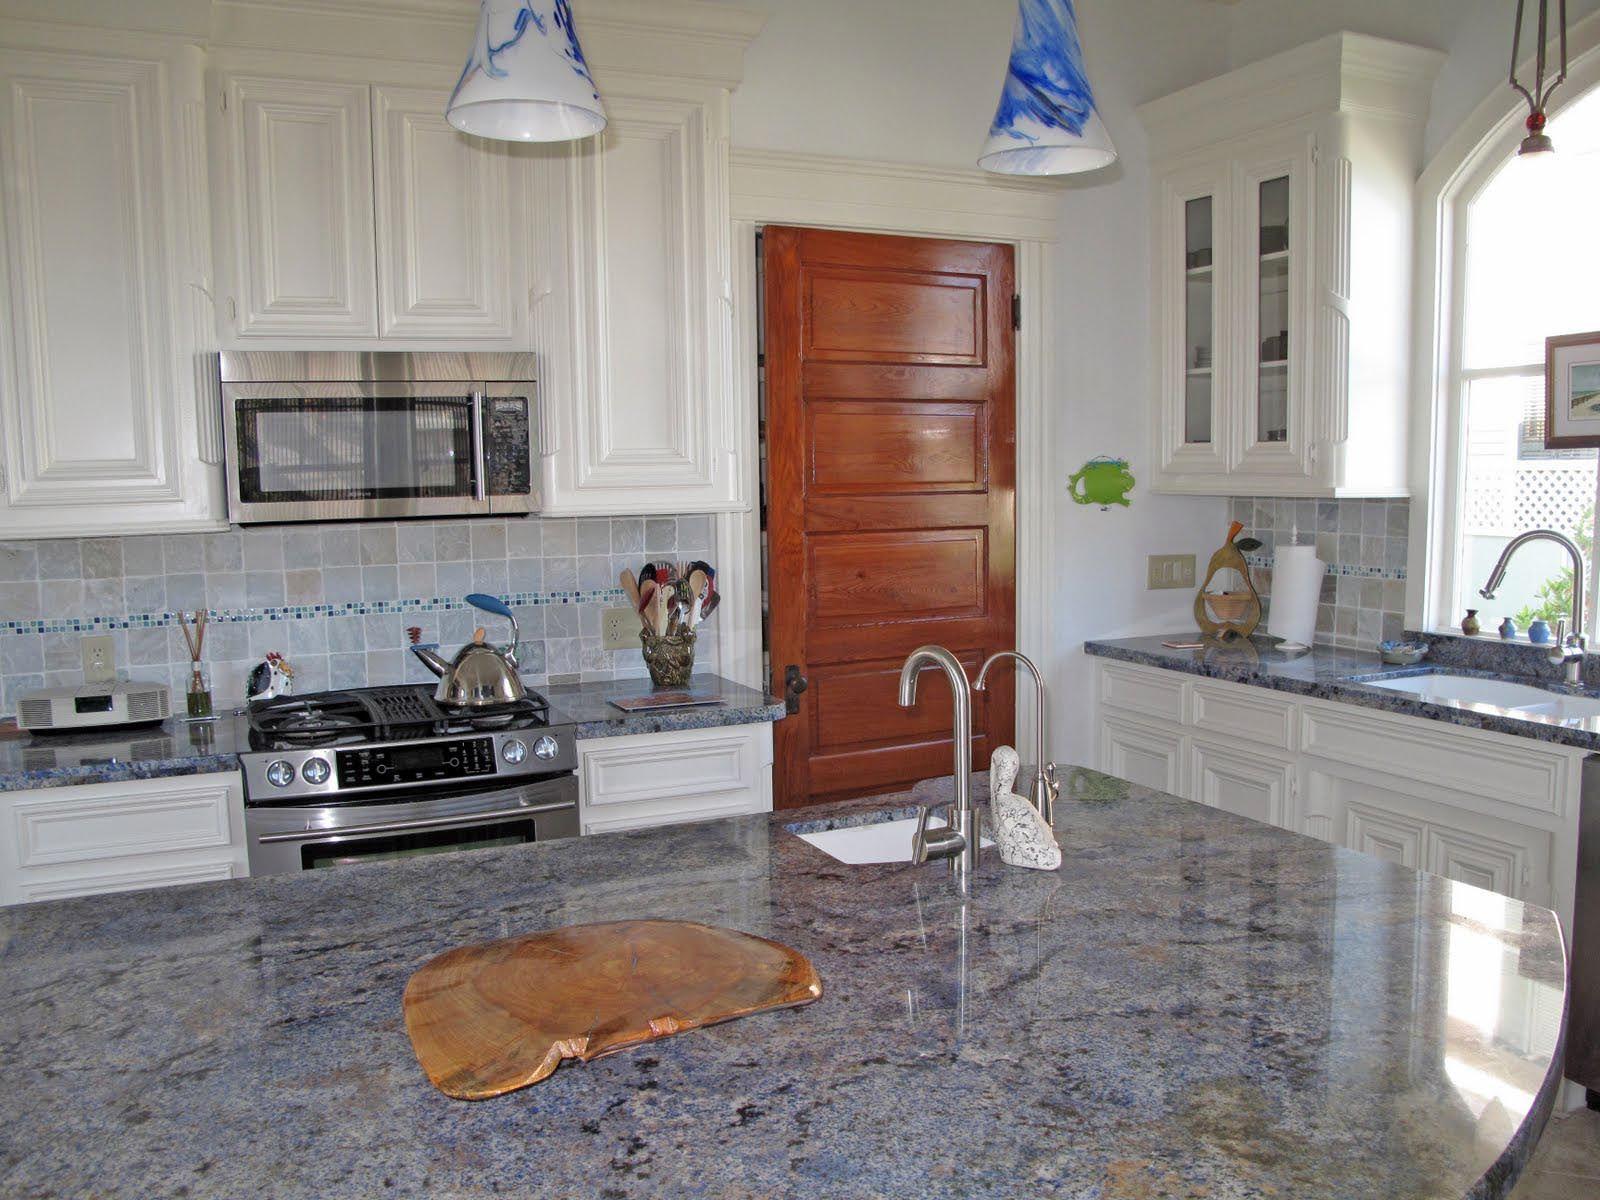 White kitchen cabinets with grey granite countertops - Blue Bahia Granite Kitchen Countertop Island